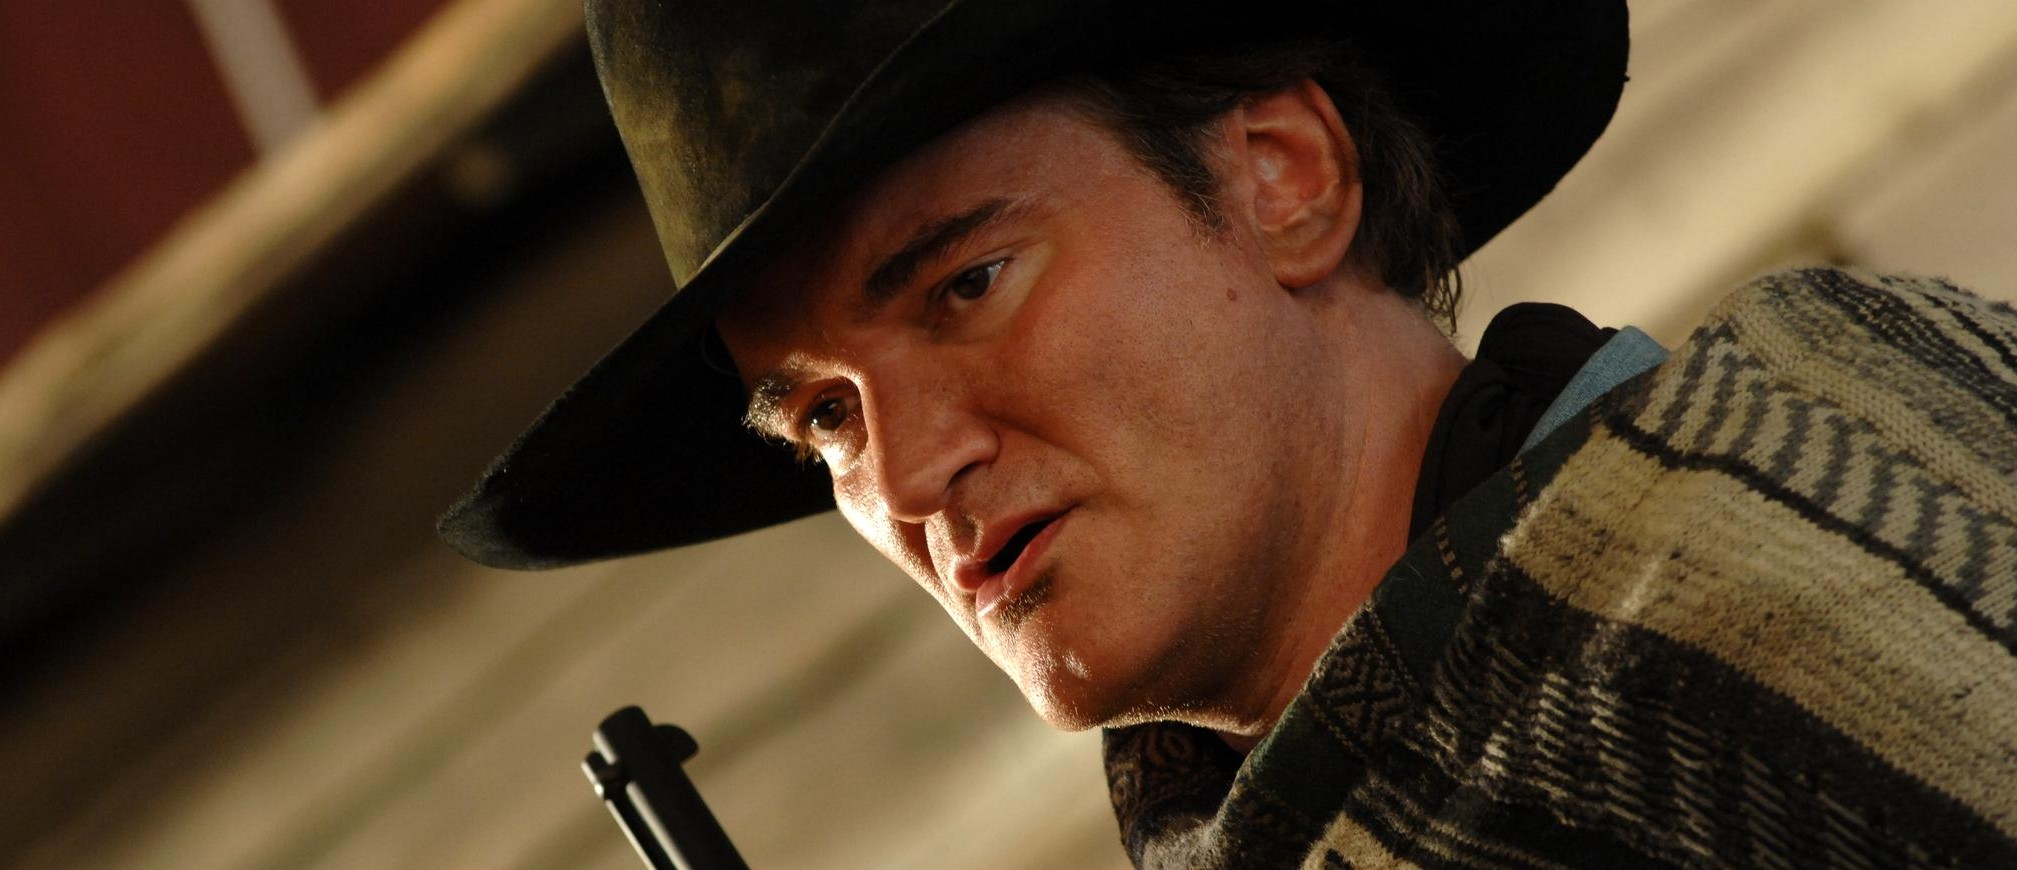 Quentin Tarantino avlyser The Hateful Eight